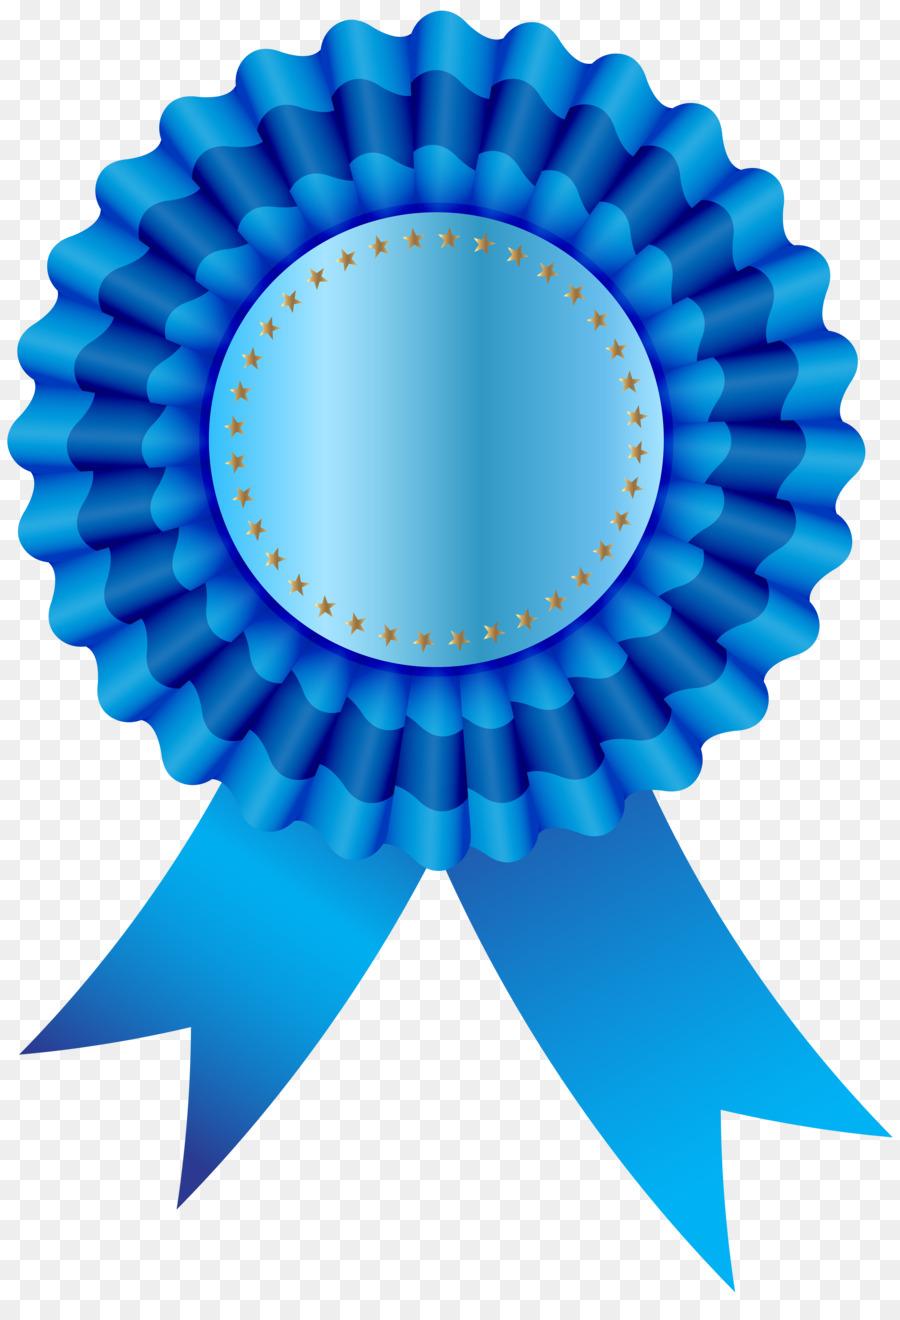 ribbon free clip art blue ribbon png download 5525 8000 free rh kisspng com blue ribbon clipart free blue bow clipart